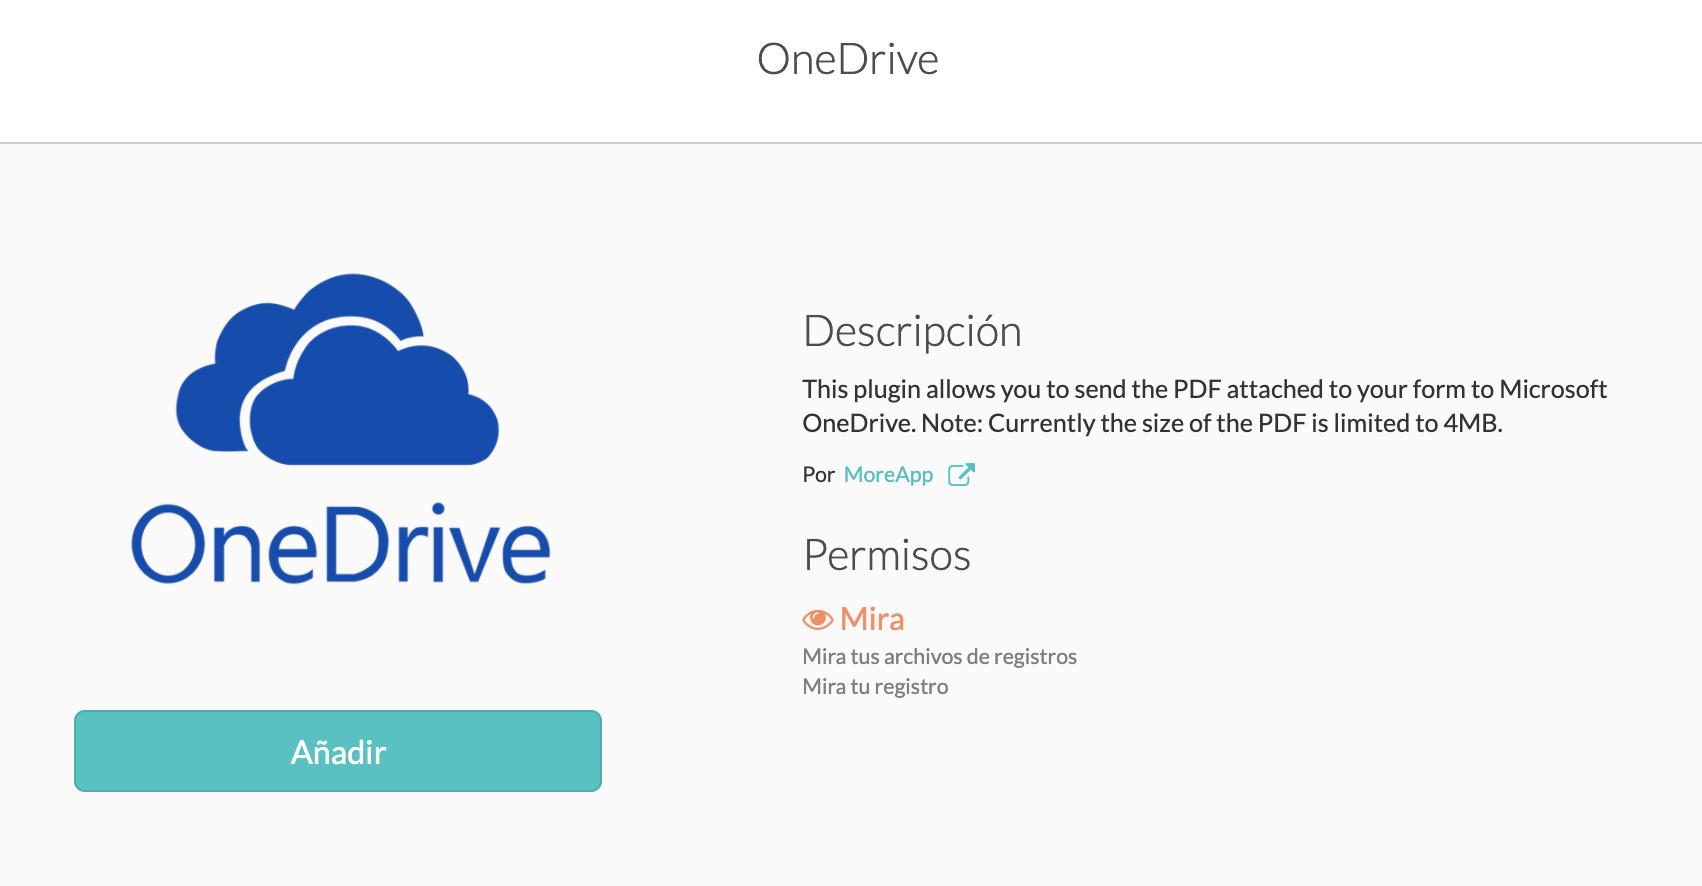 Integra MoreApp con OneDrive